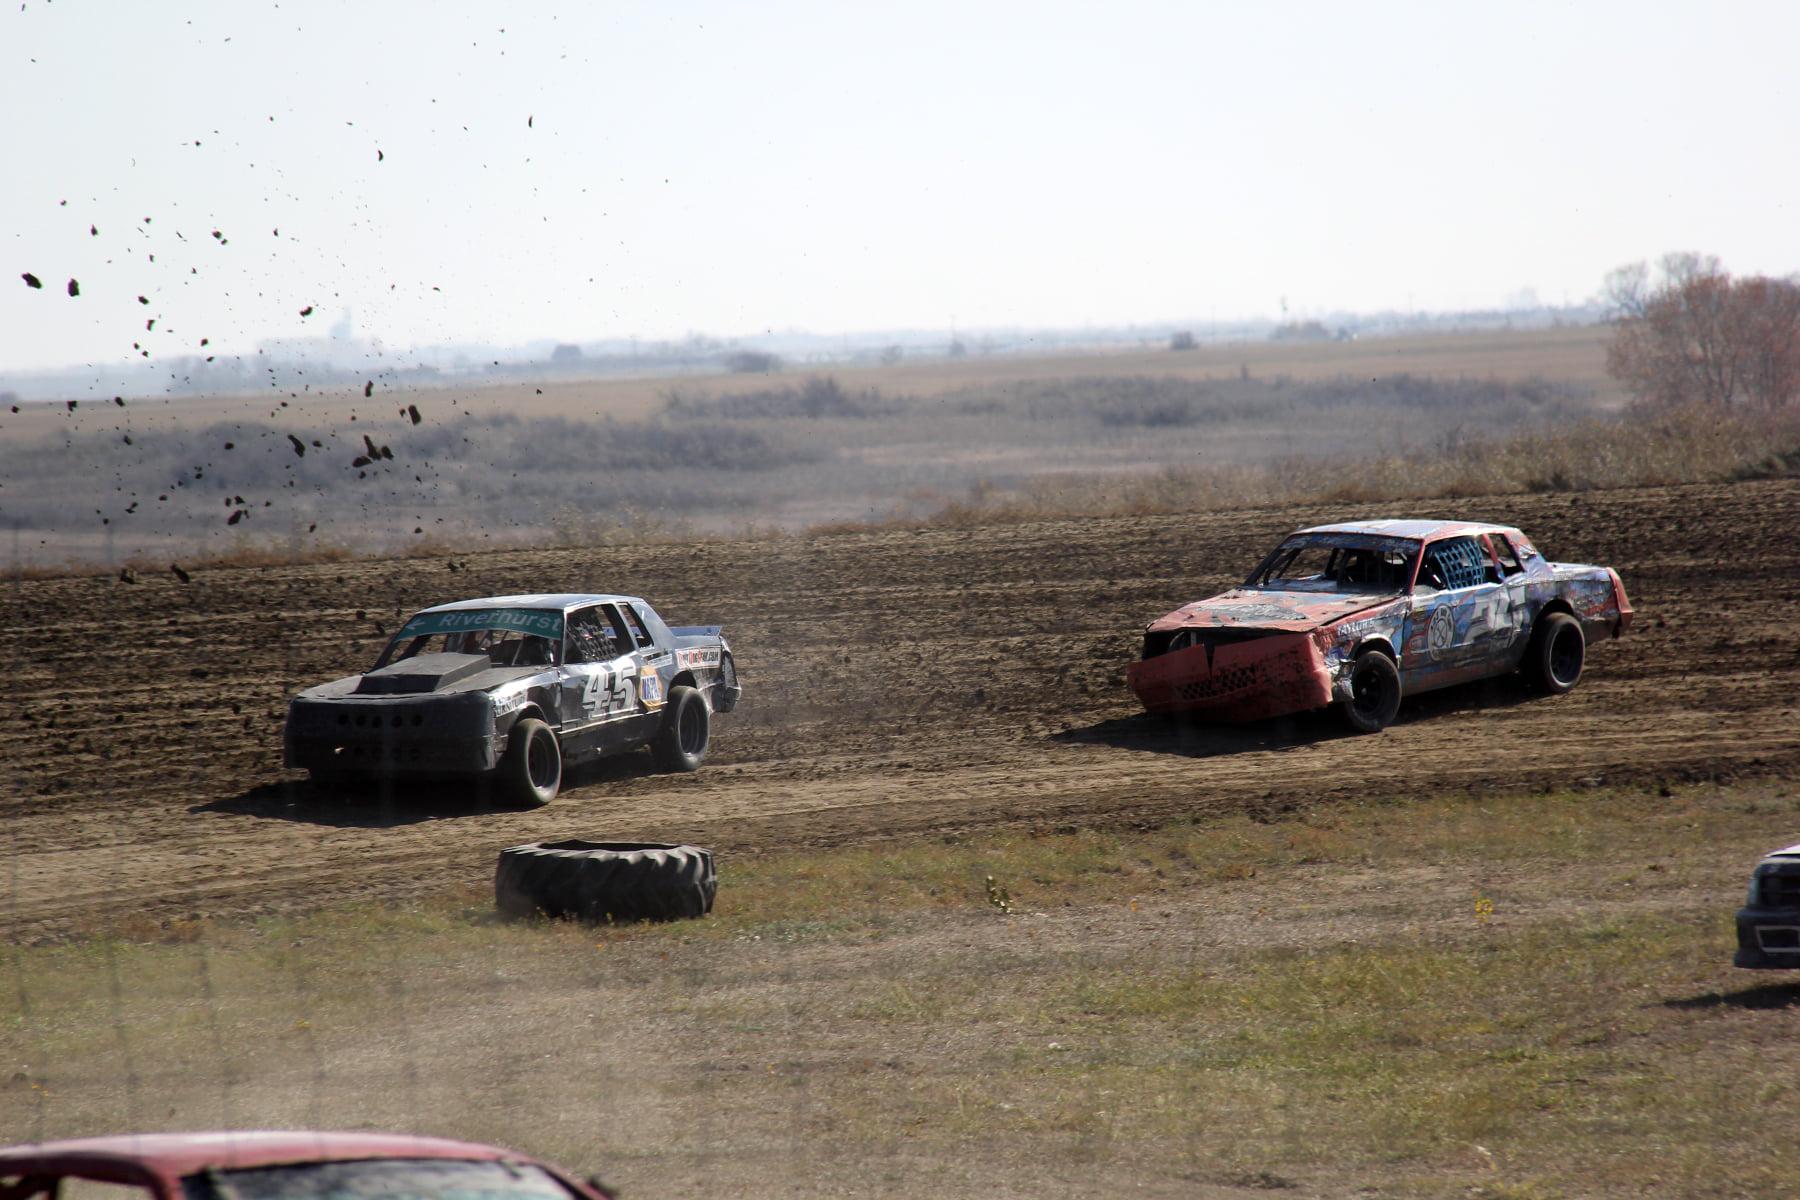 Outlook_Racing_Kemmer_Racing_Photography_3.jpg